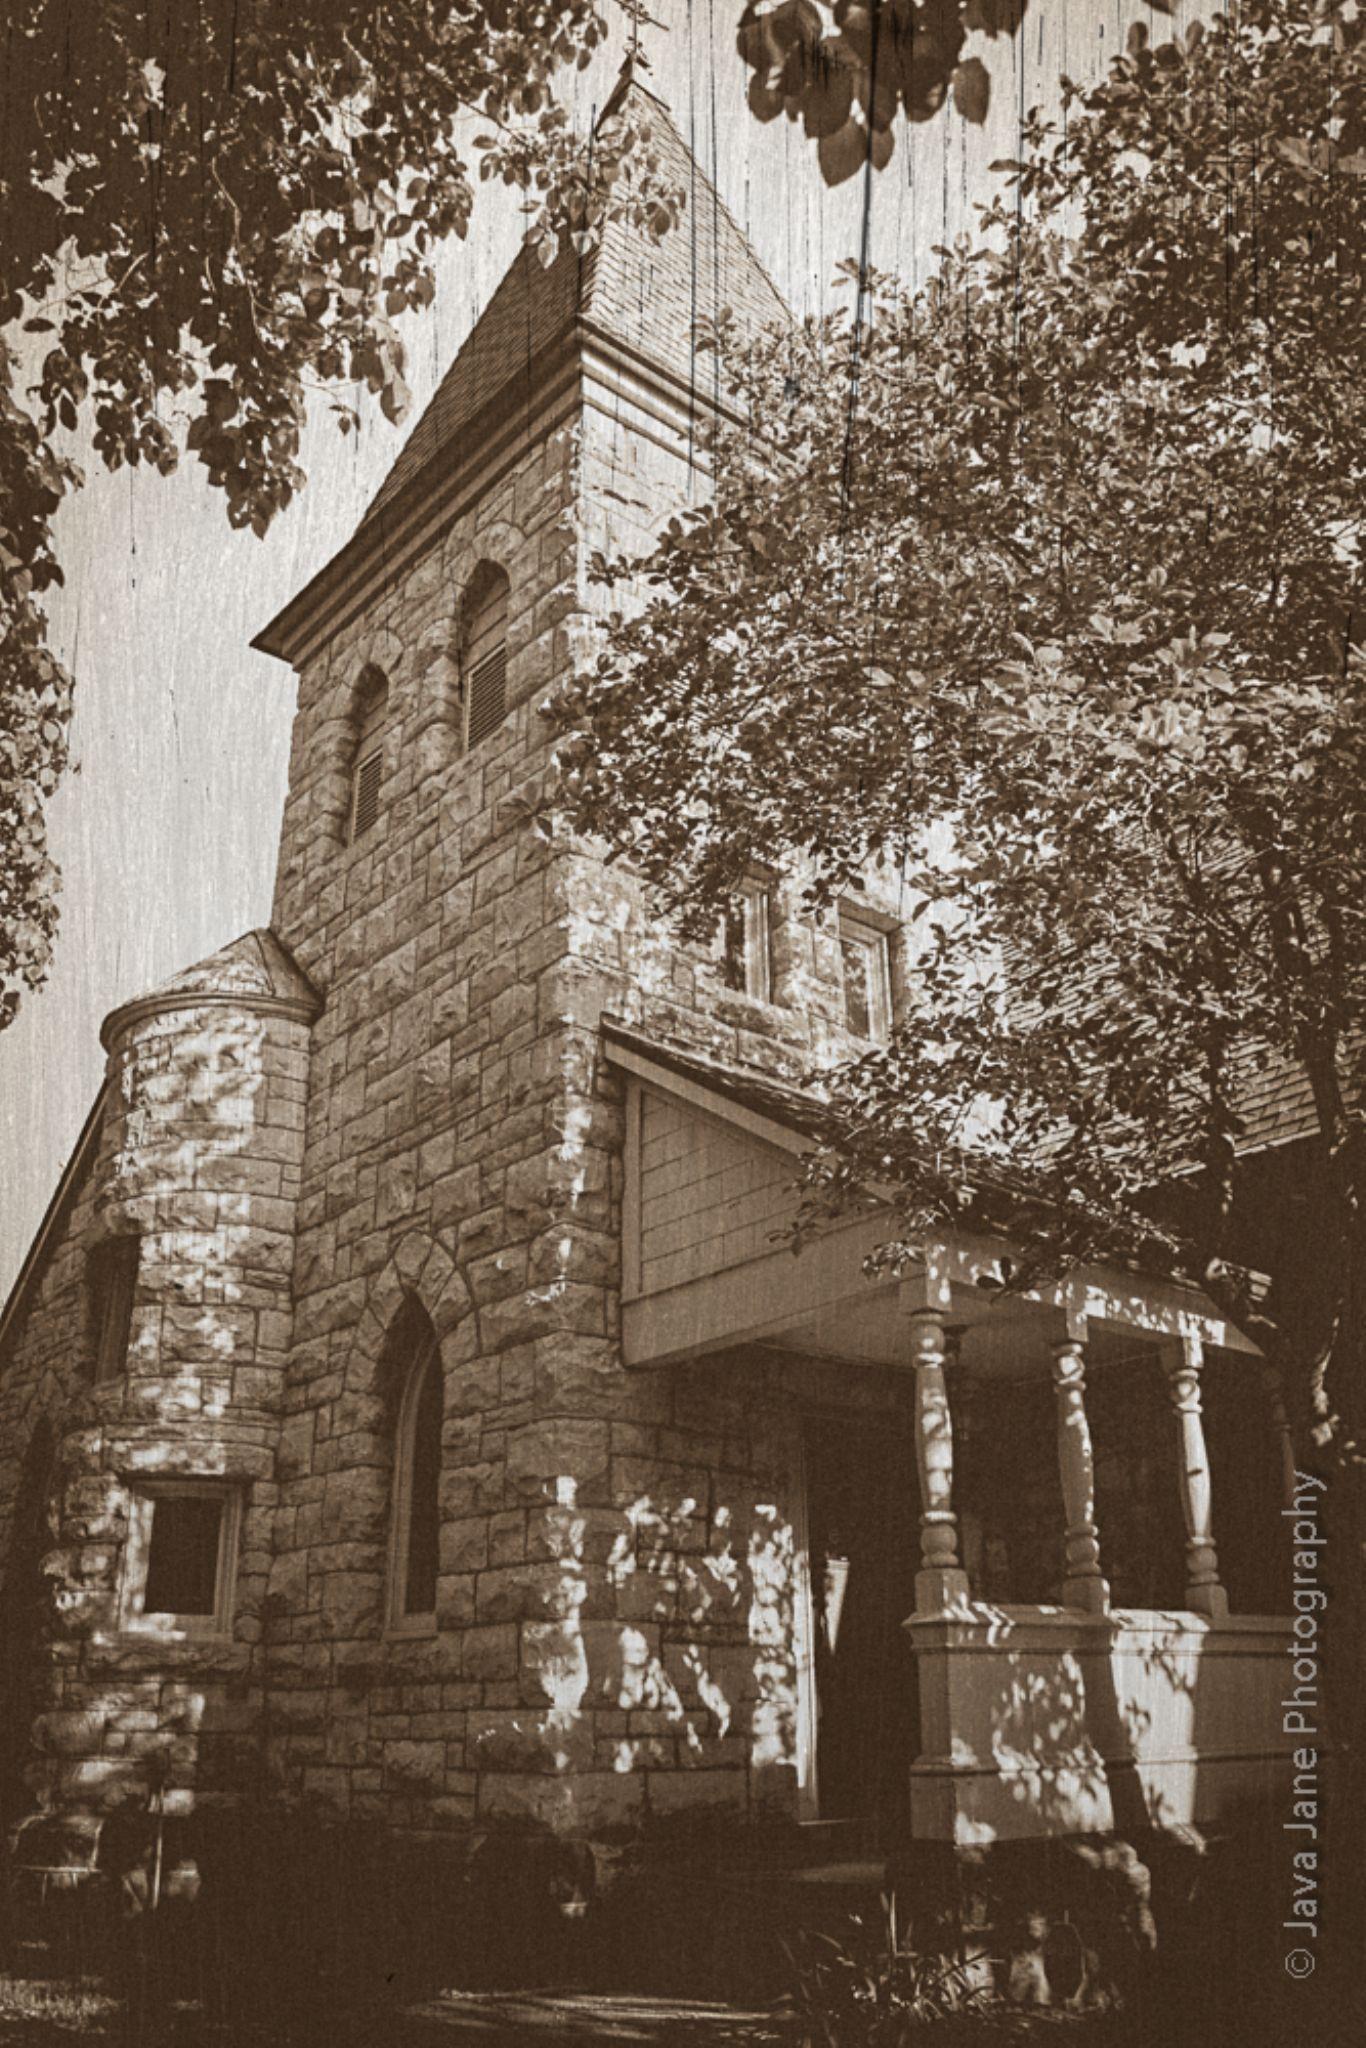 Old Skool Church by Tony Harris